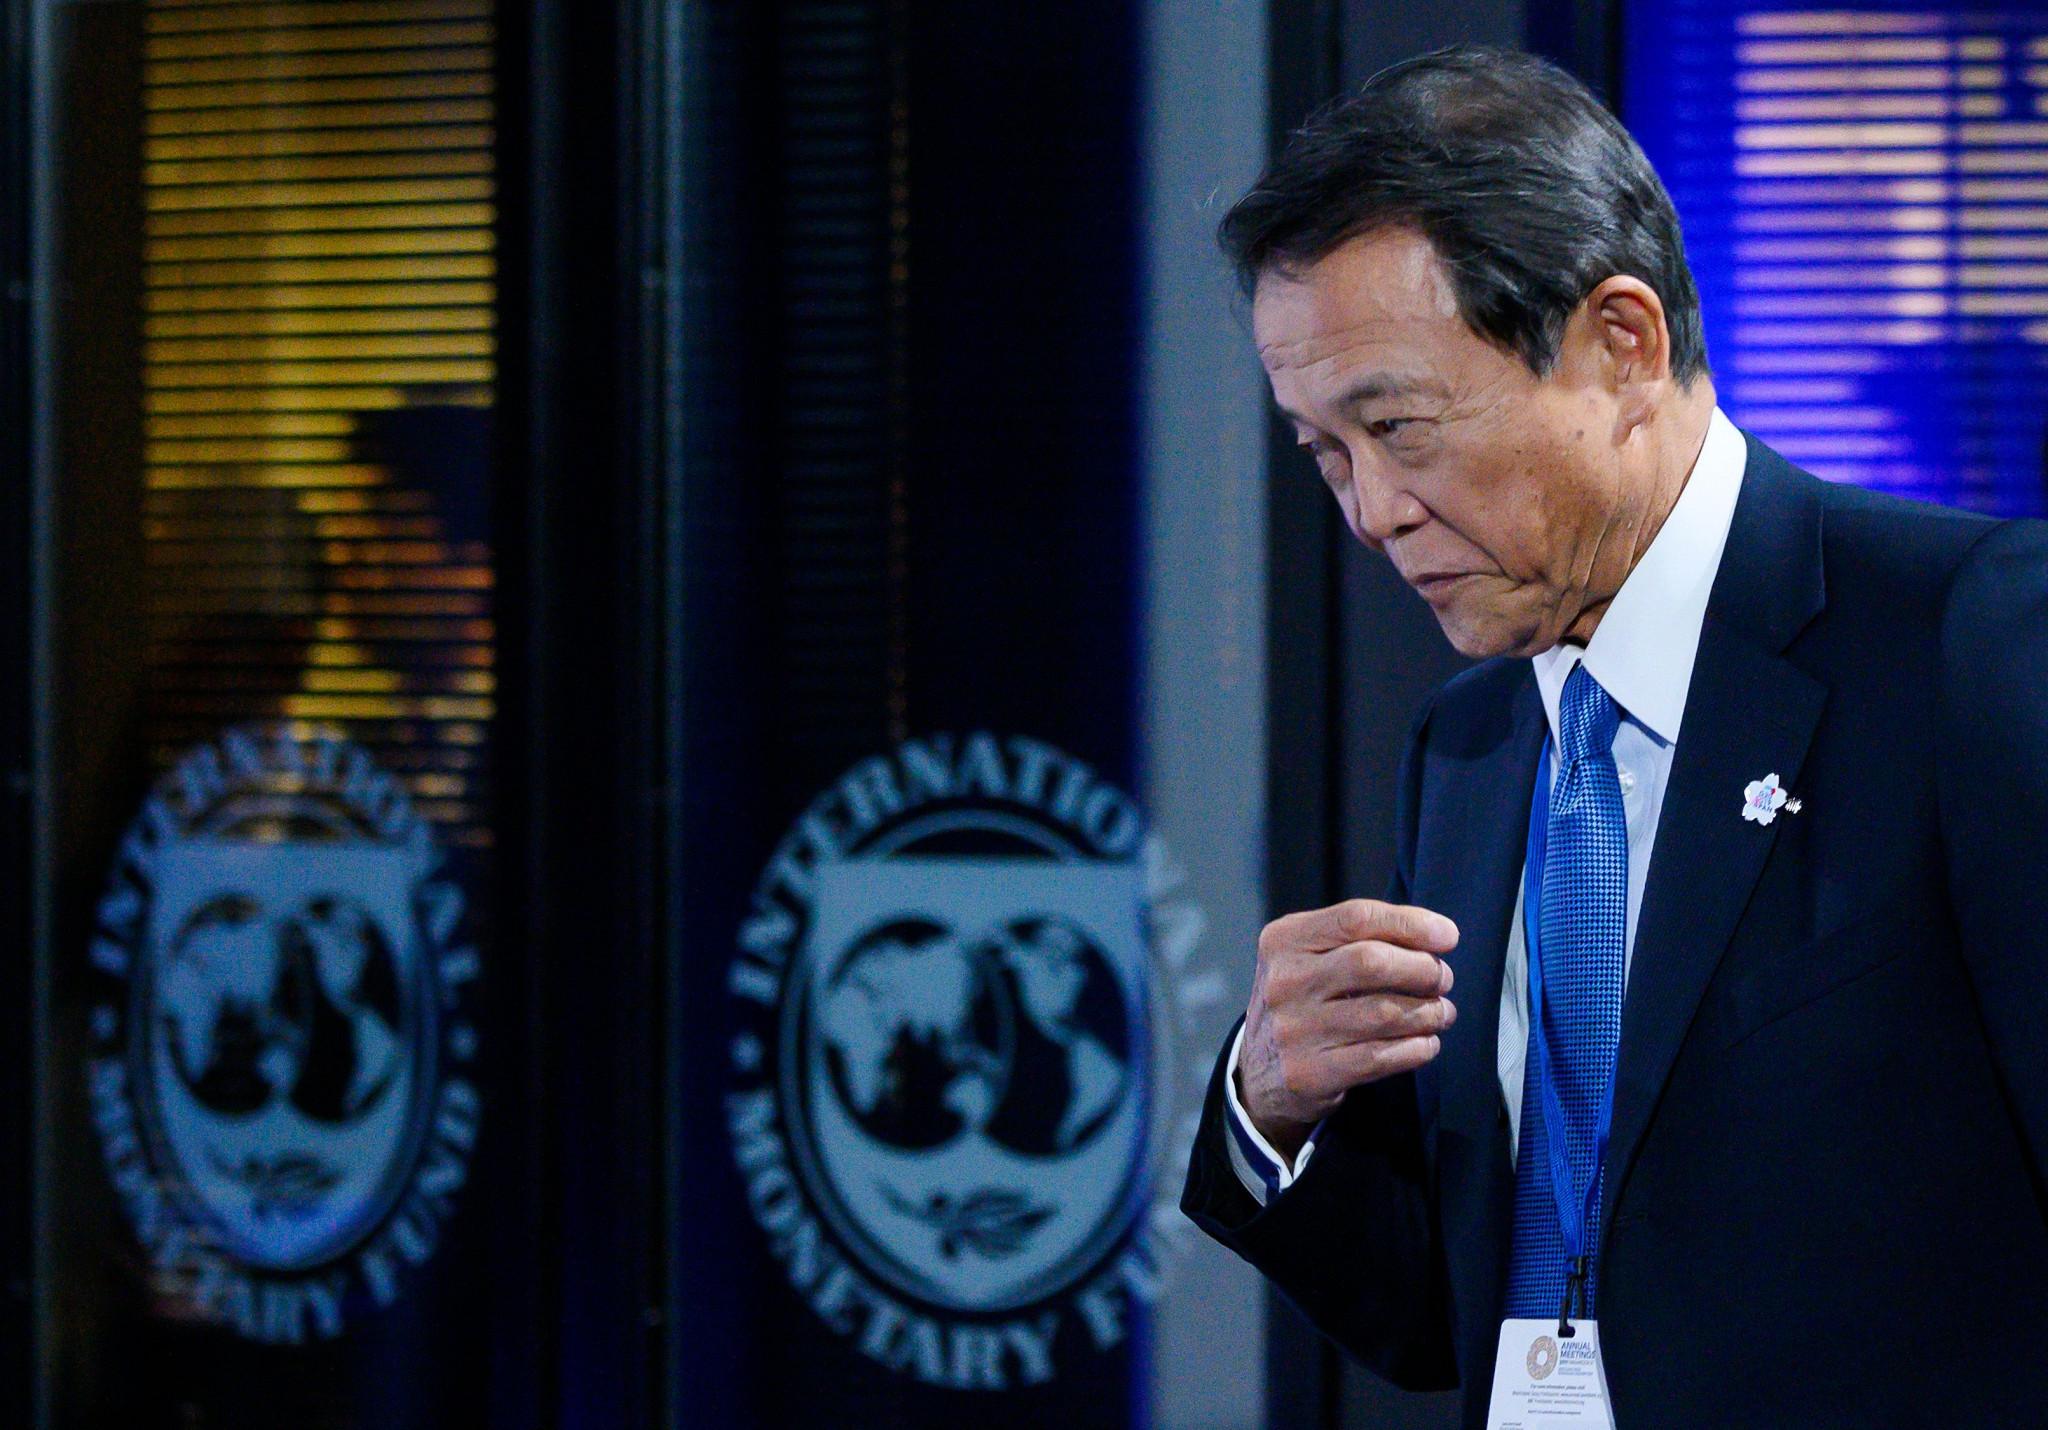 Japanese Deputy Prime Minister Tarō Asō recently called the Olympics